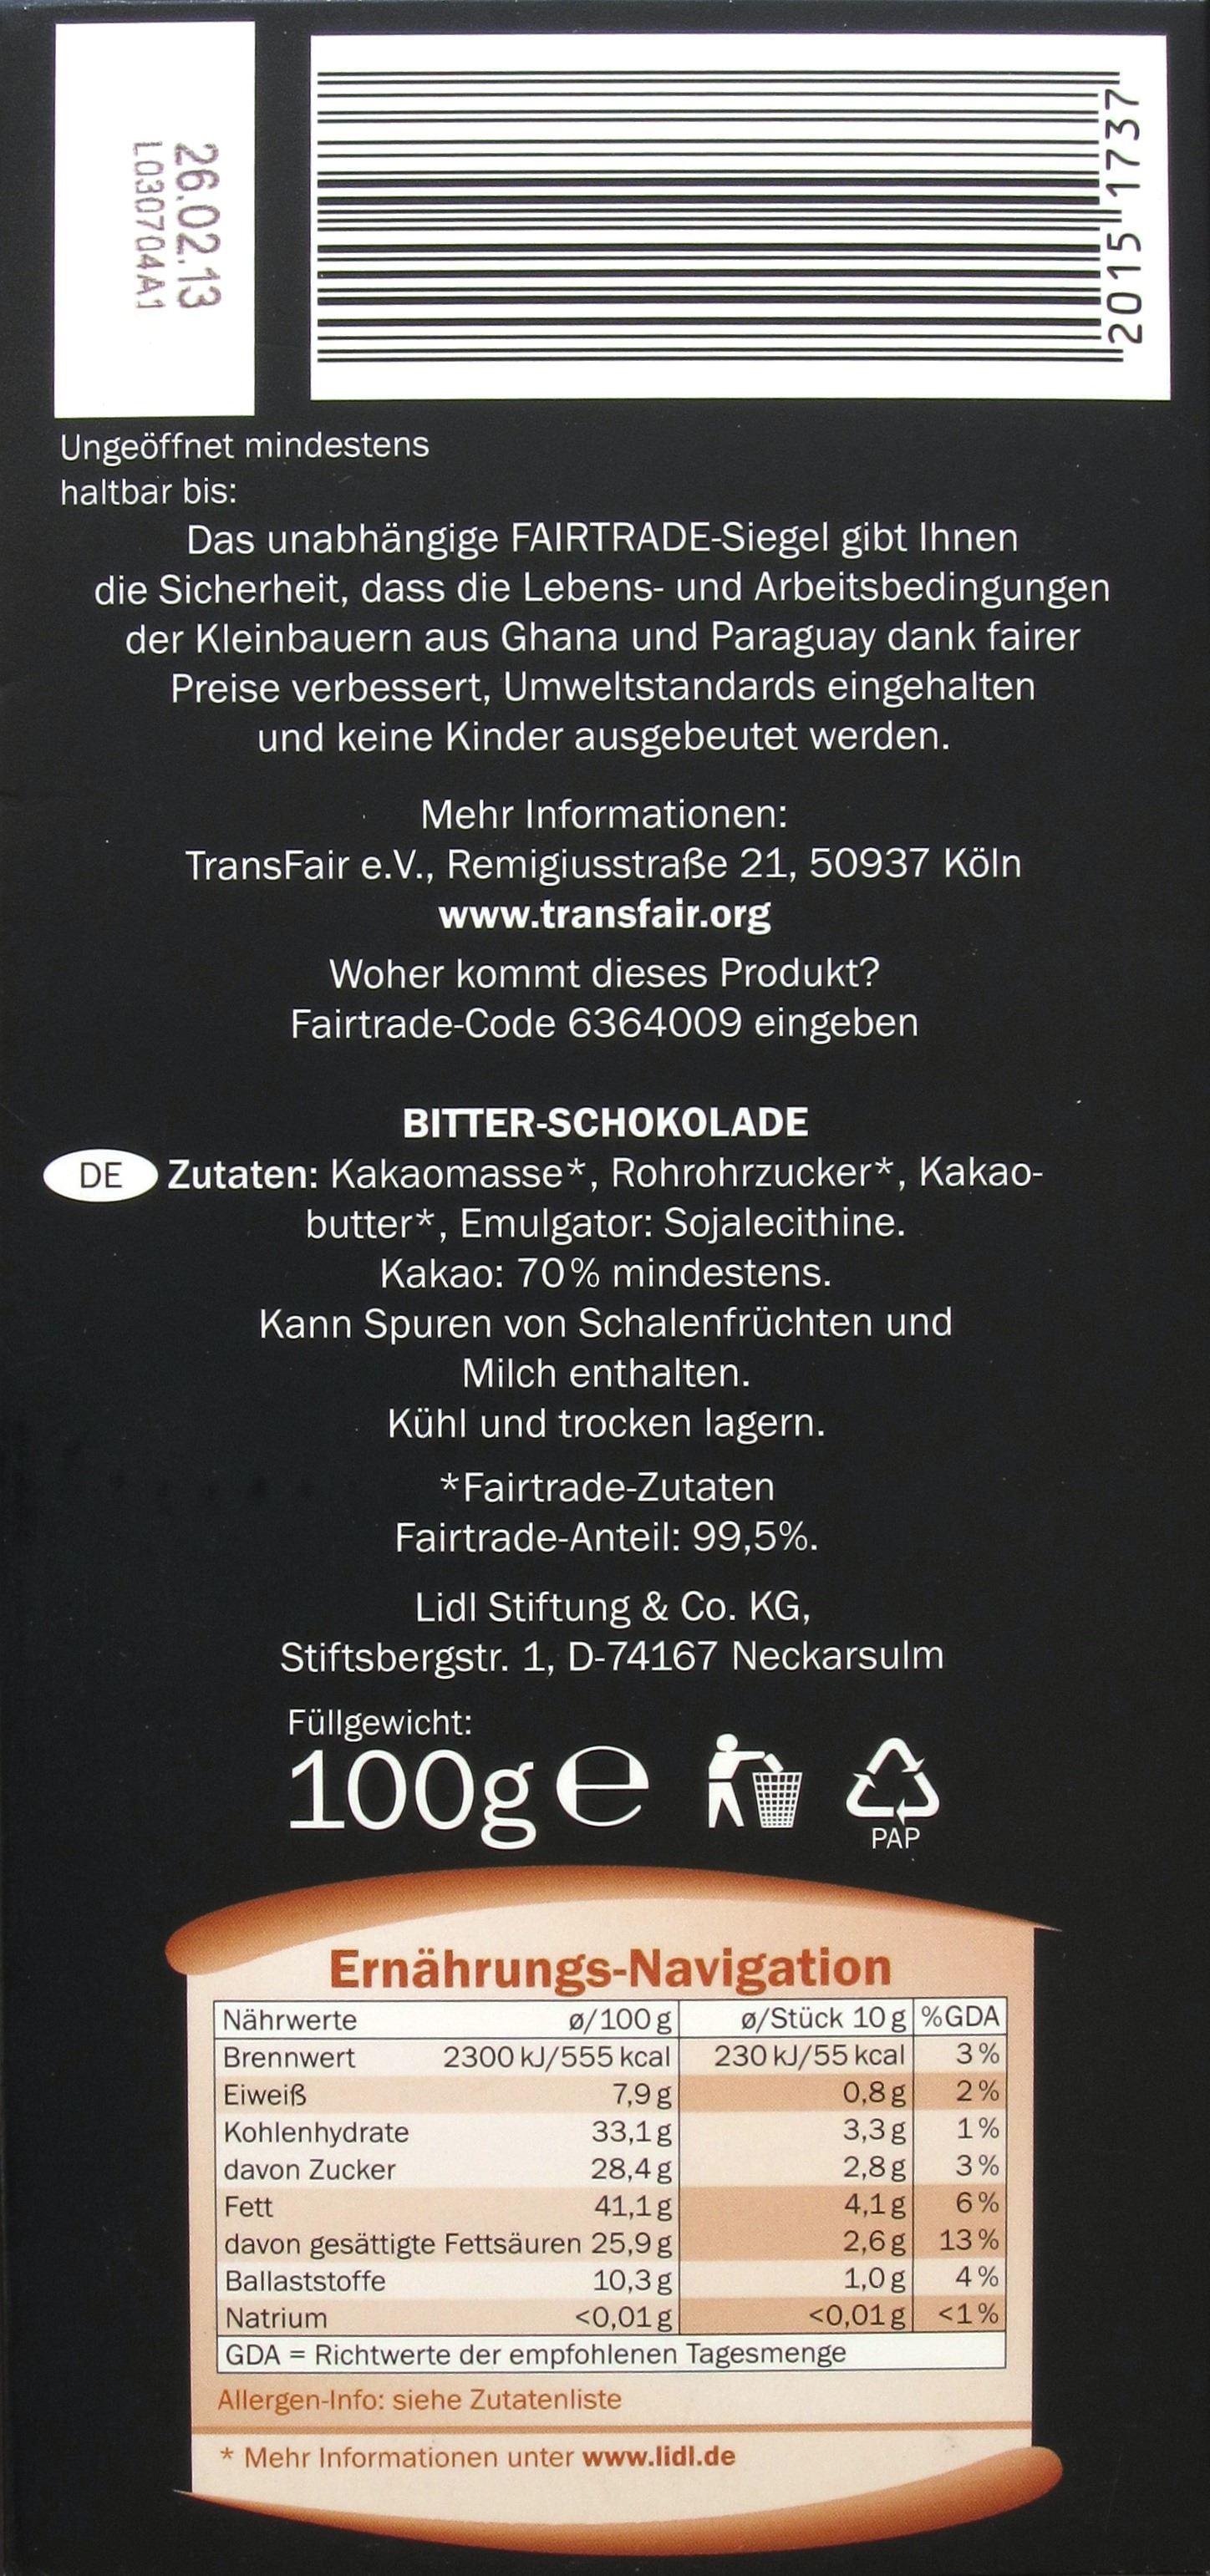 LIDLs Fairglobe Dunkle Schokolade, 70% (Rückseite)